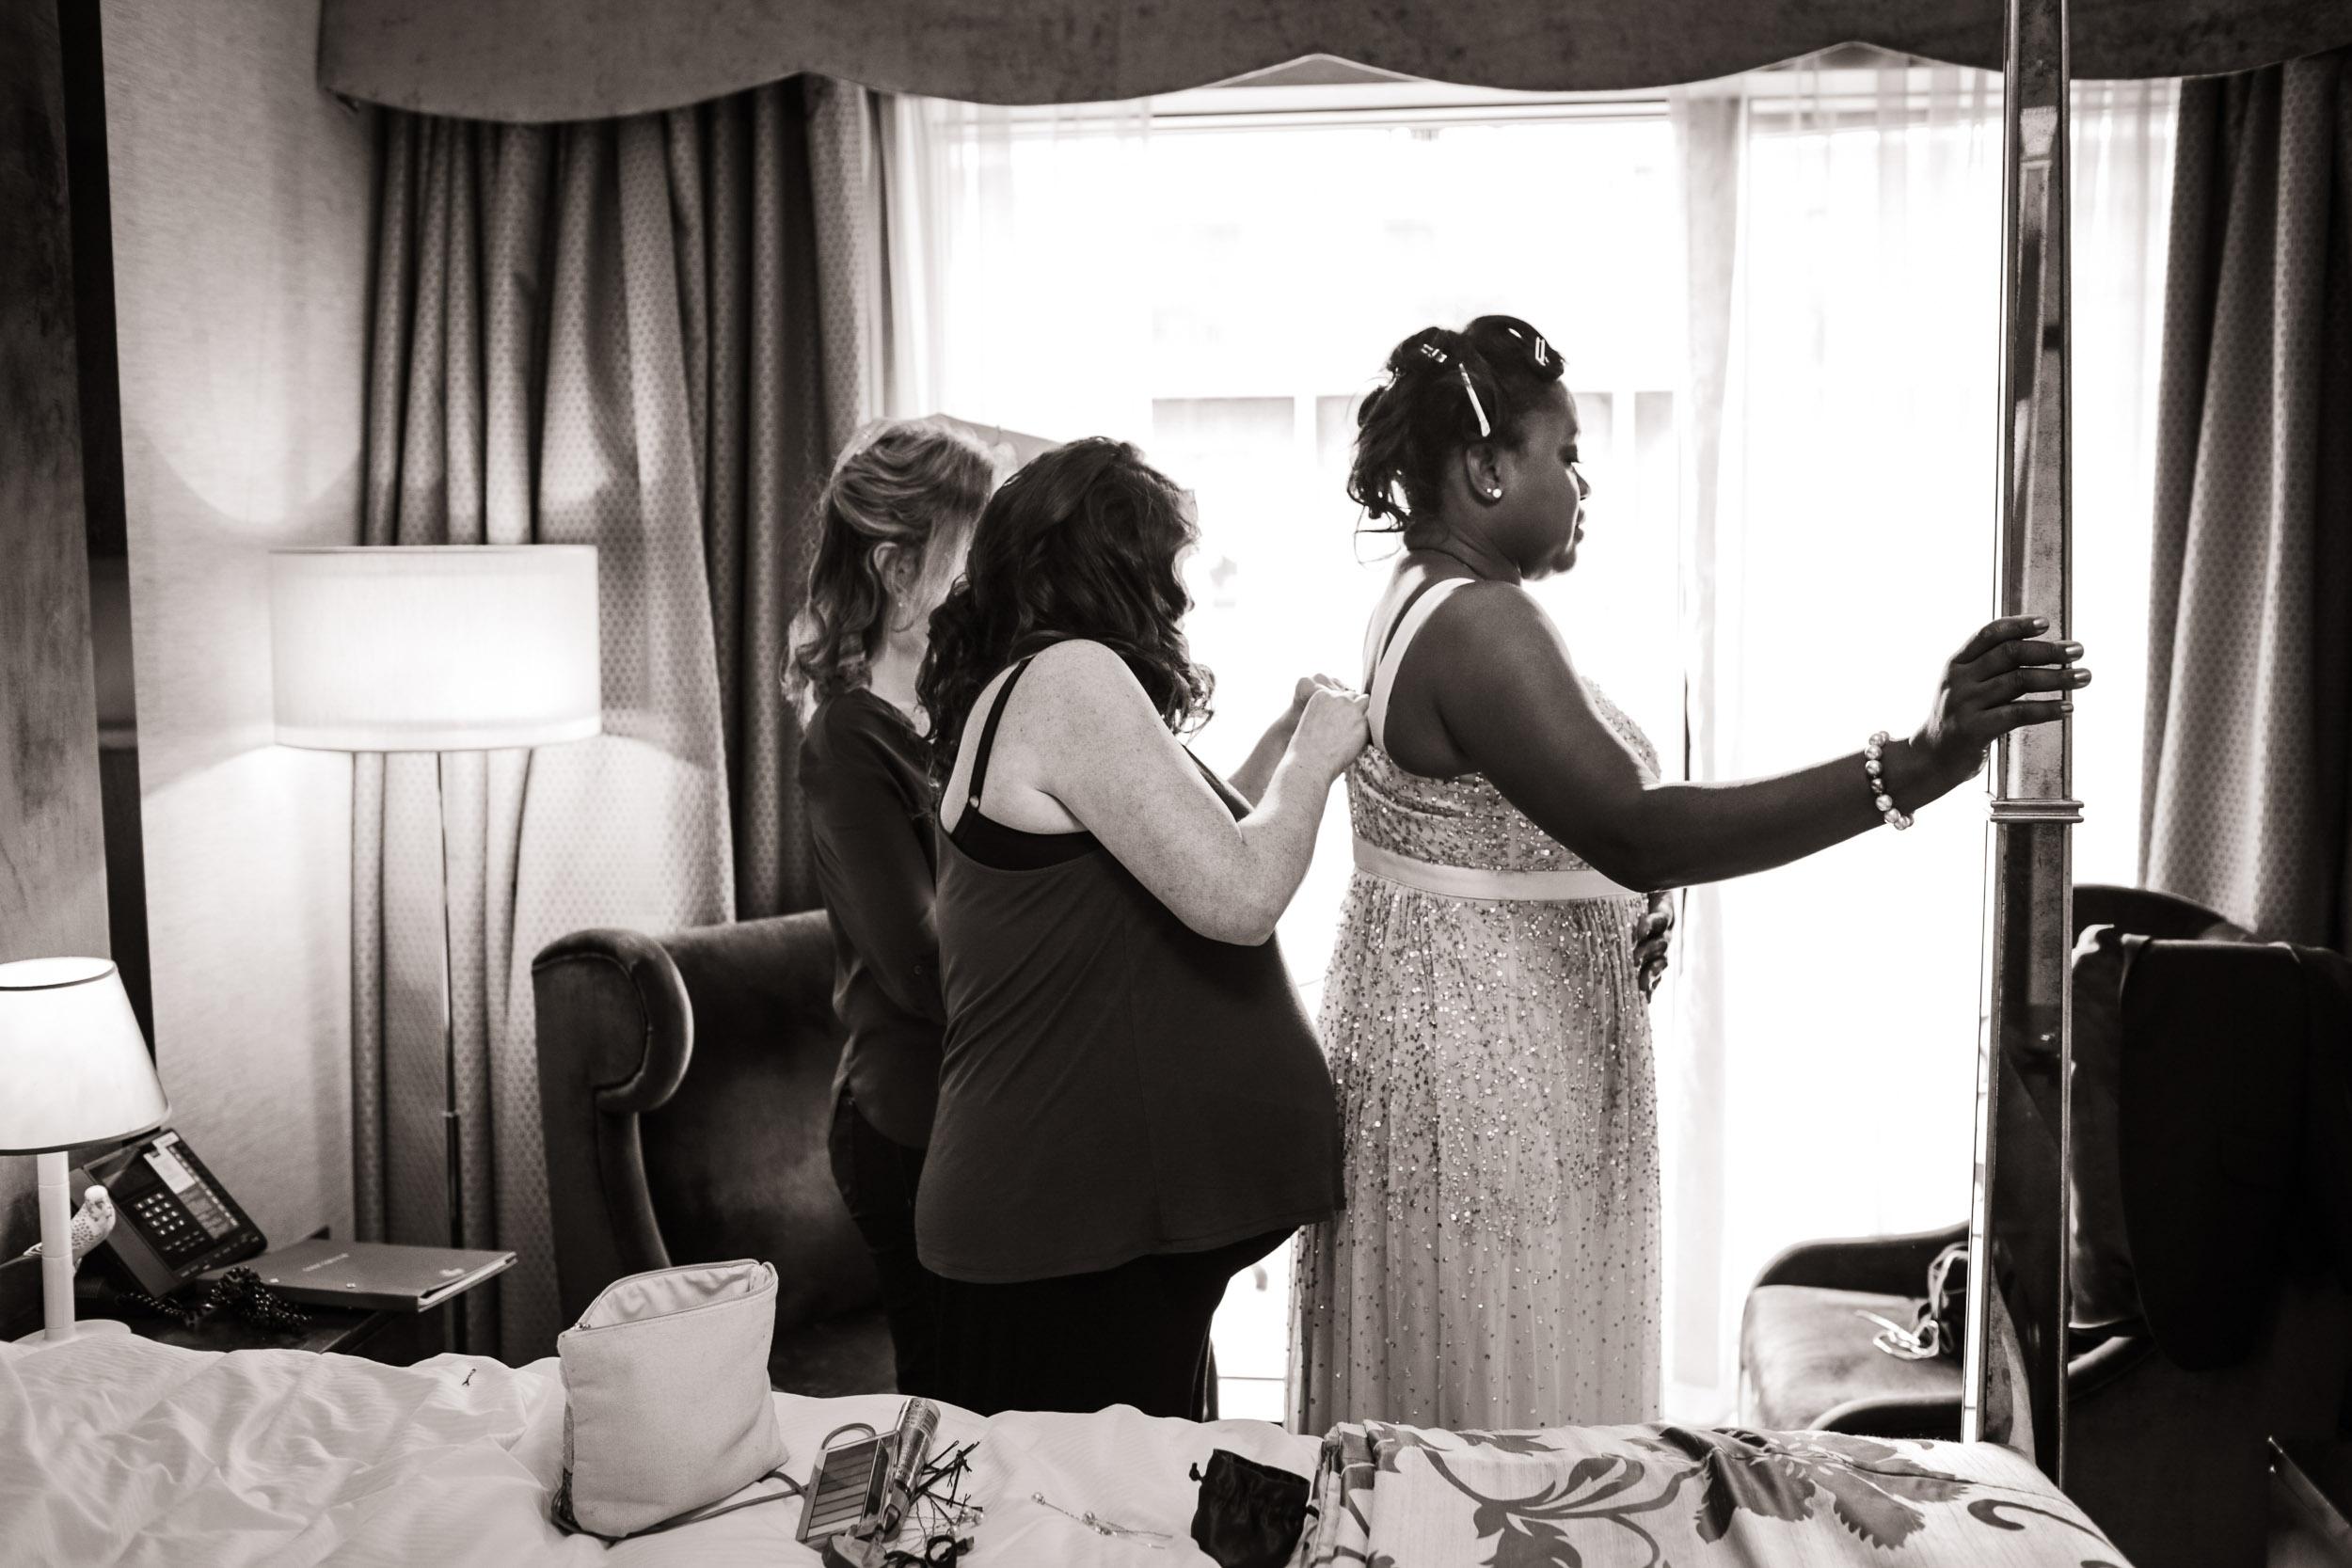 syon-house-wedding-photographer-london 007.jpg